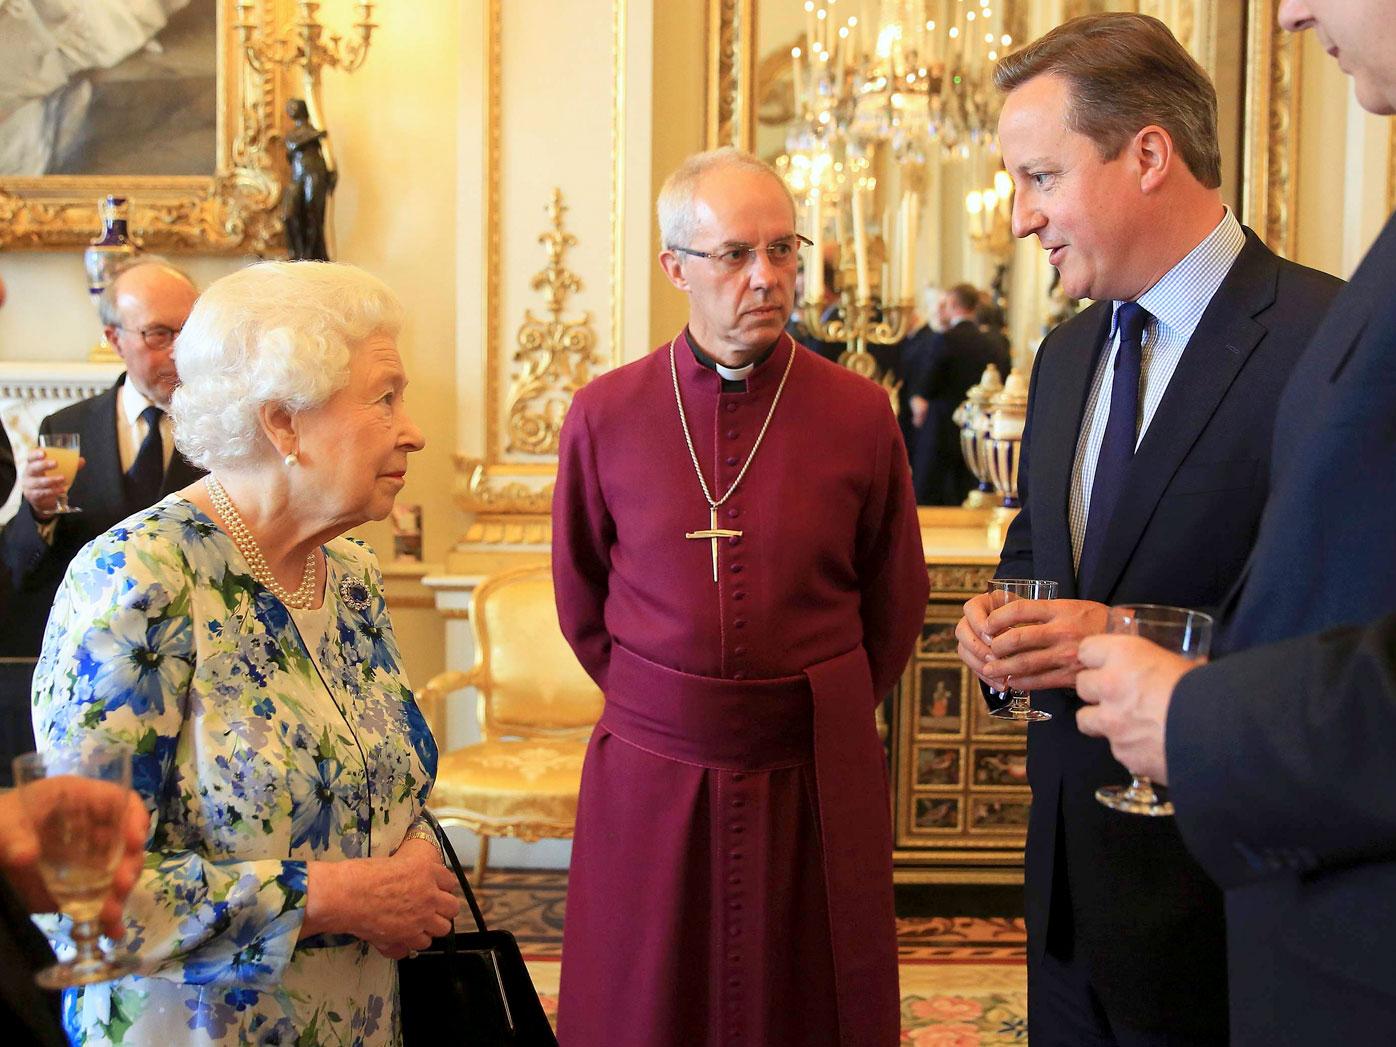 British PM calls Nigeria, Afghanistan 'most corrupt countries'